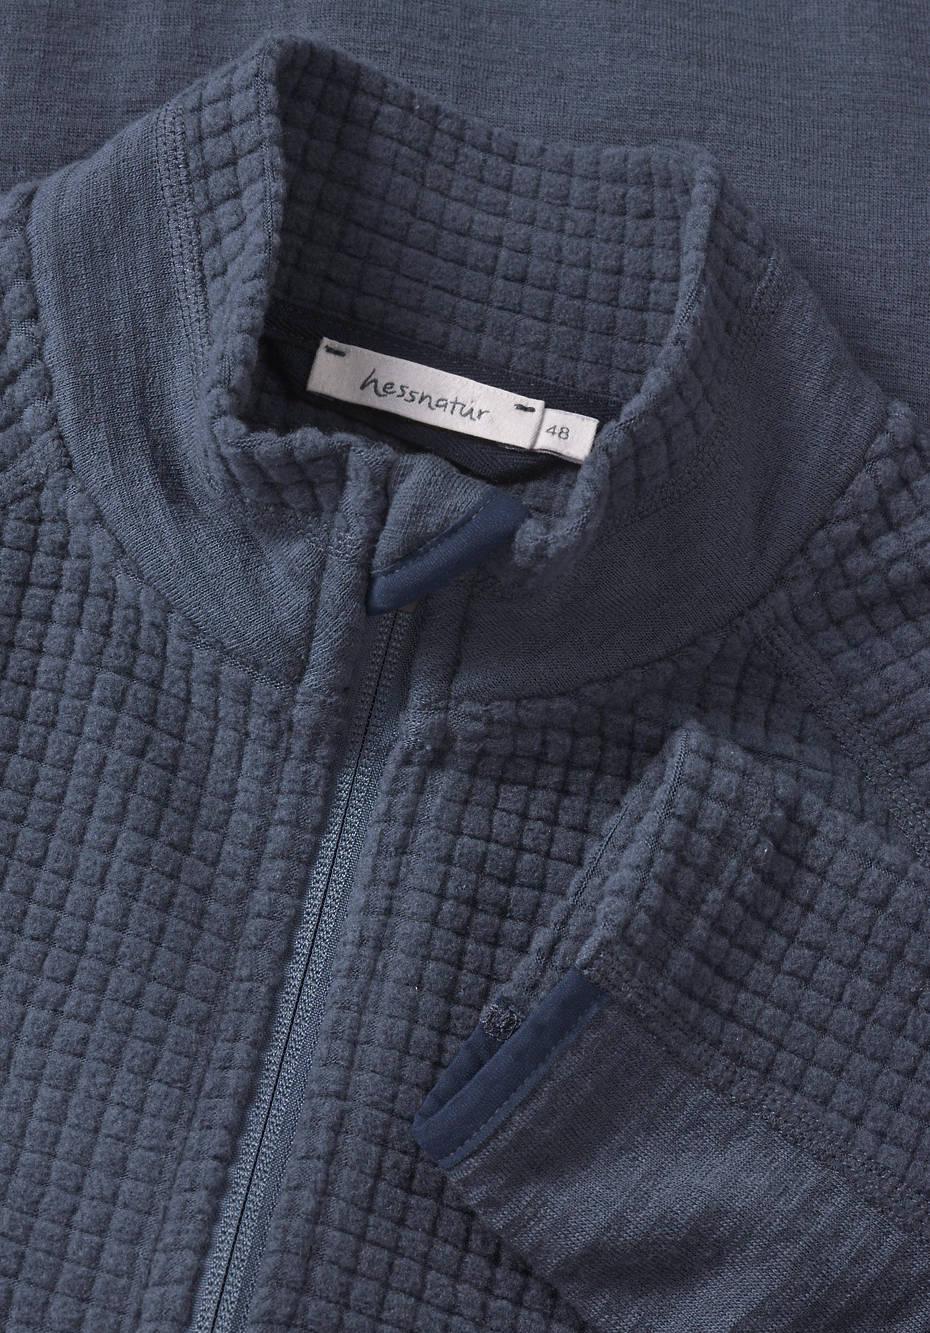 Performance fleece jacket made from pure organic merino wool